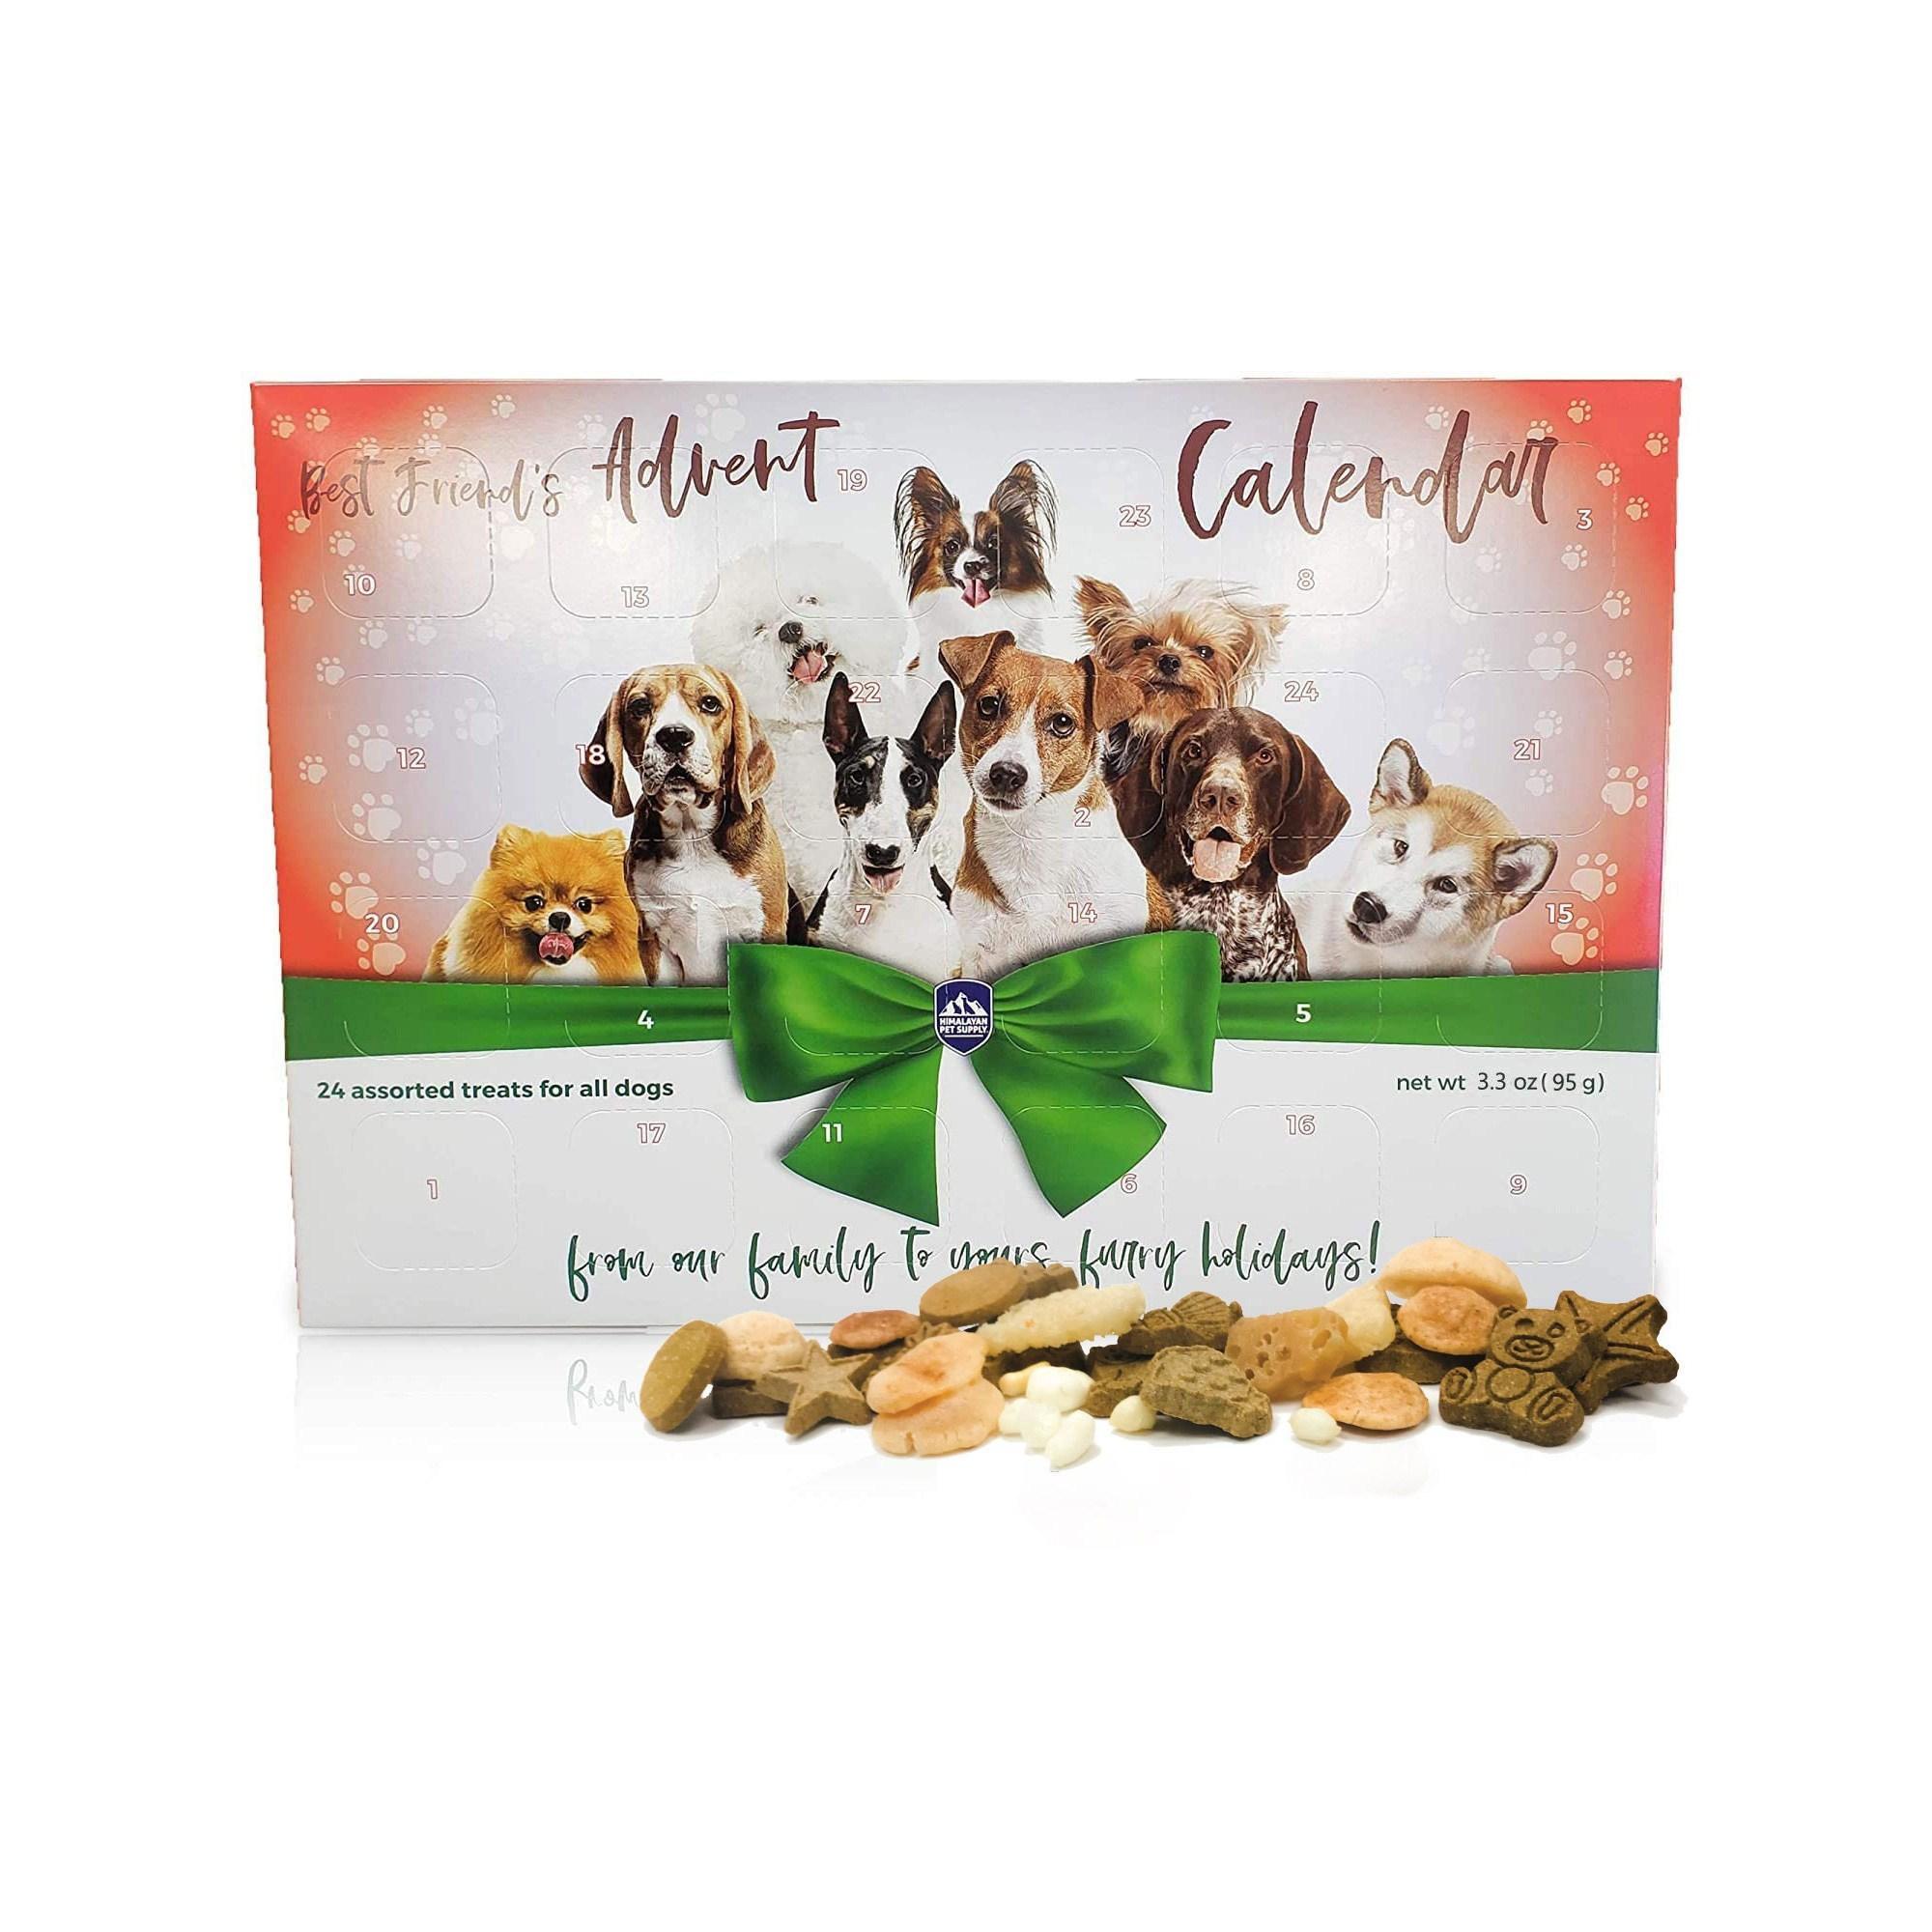 Himalayan 2020 Best Friends Advent Calendar for Dogs, 3.3-oz